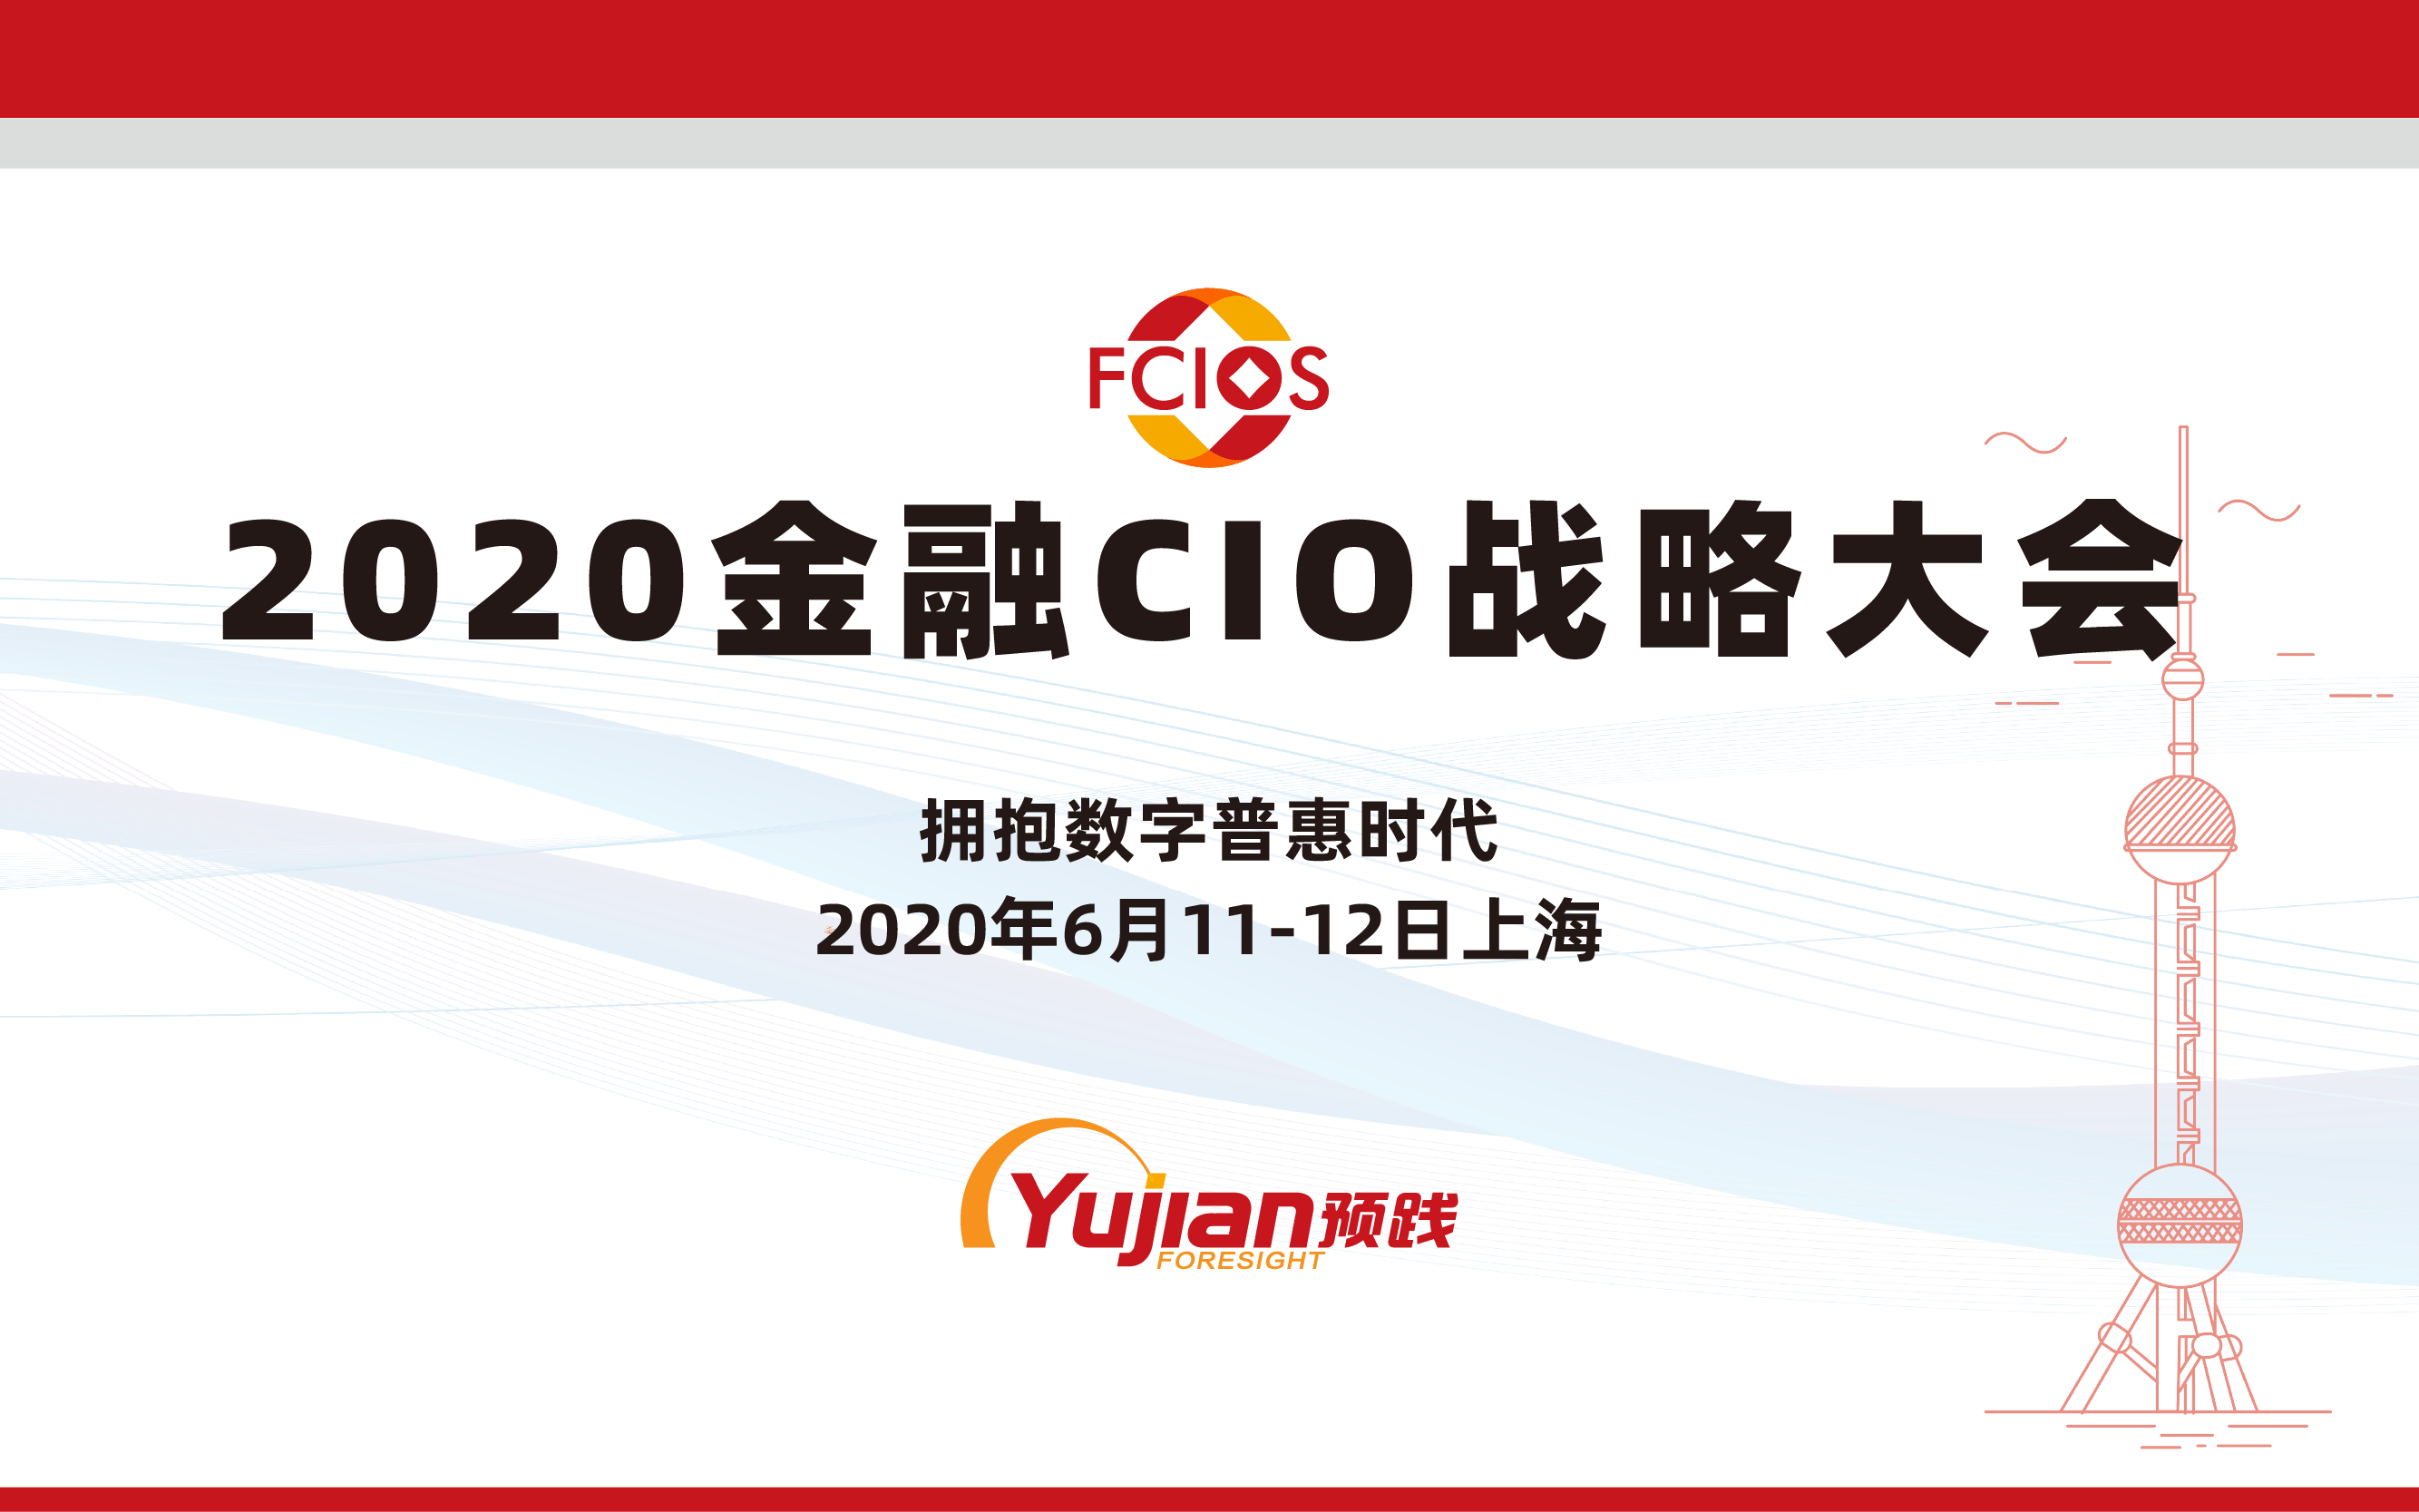 FCIOS2020金融CIO戰略大會